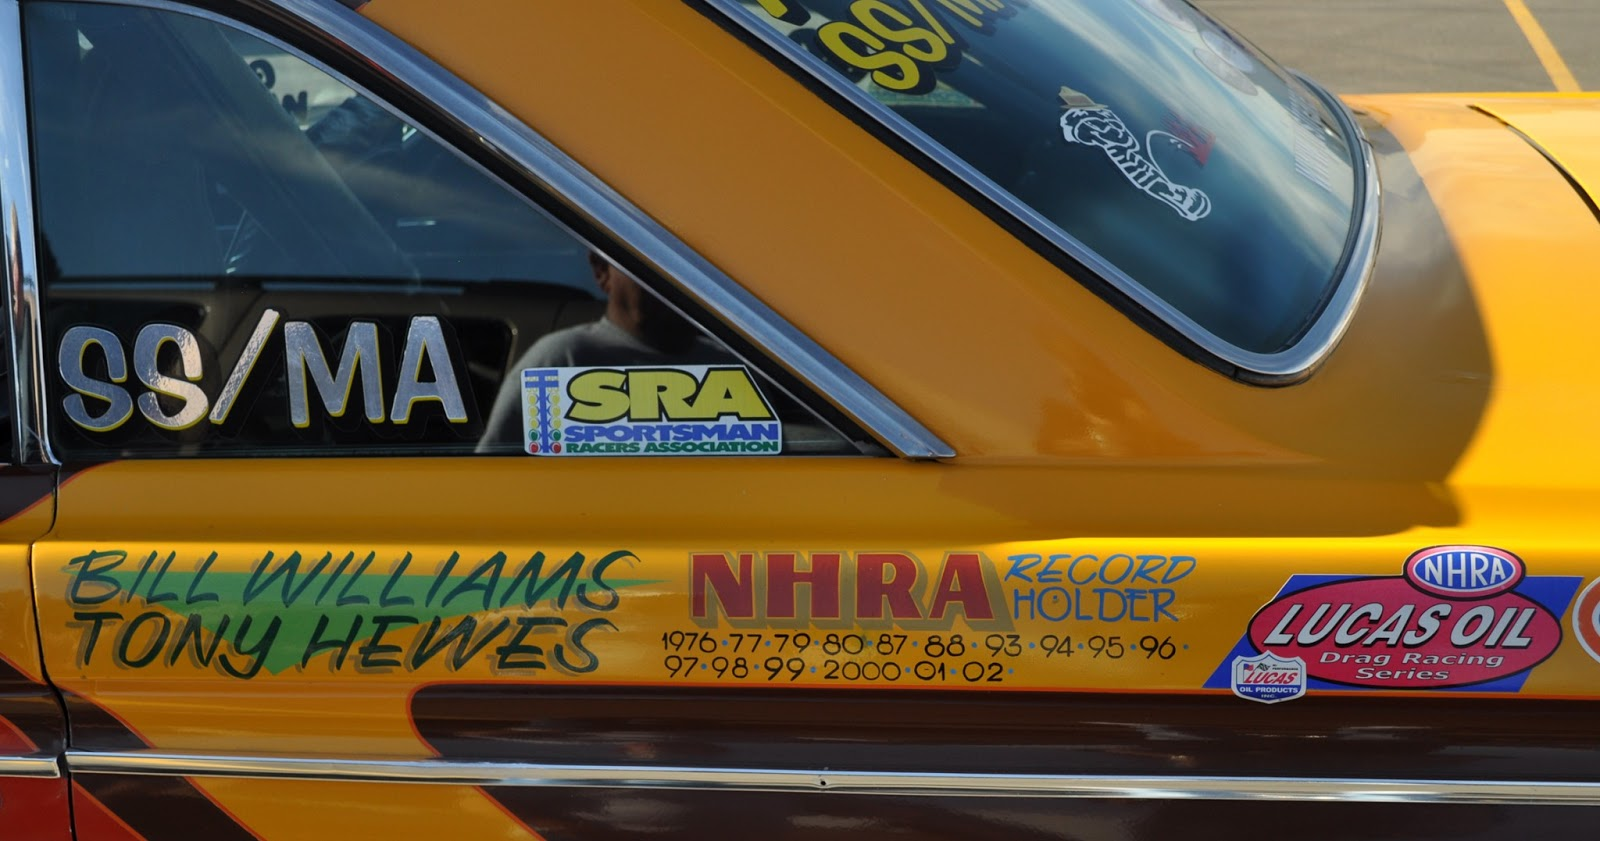 b0728b3ae Just A Car Guy: Team Smokey Comet, NHRA record holder for 1976 77 79 ...